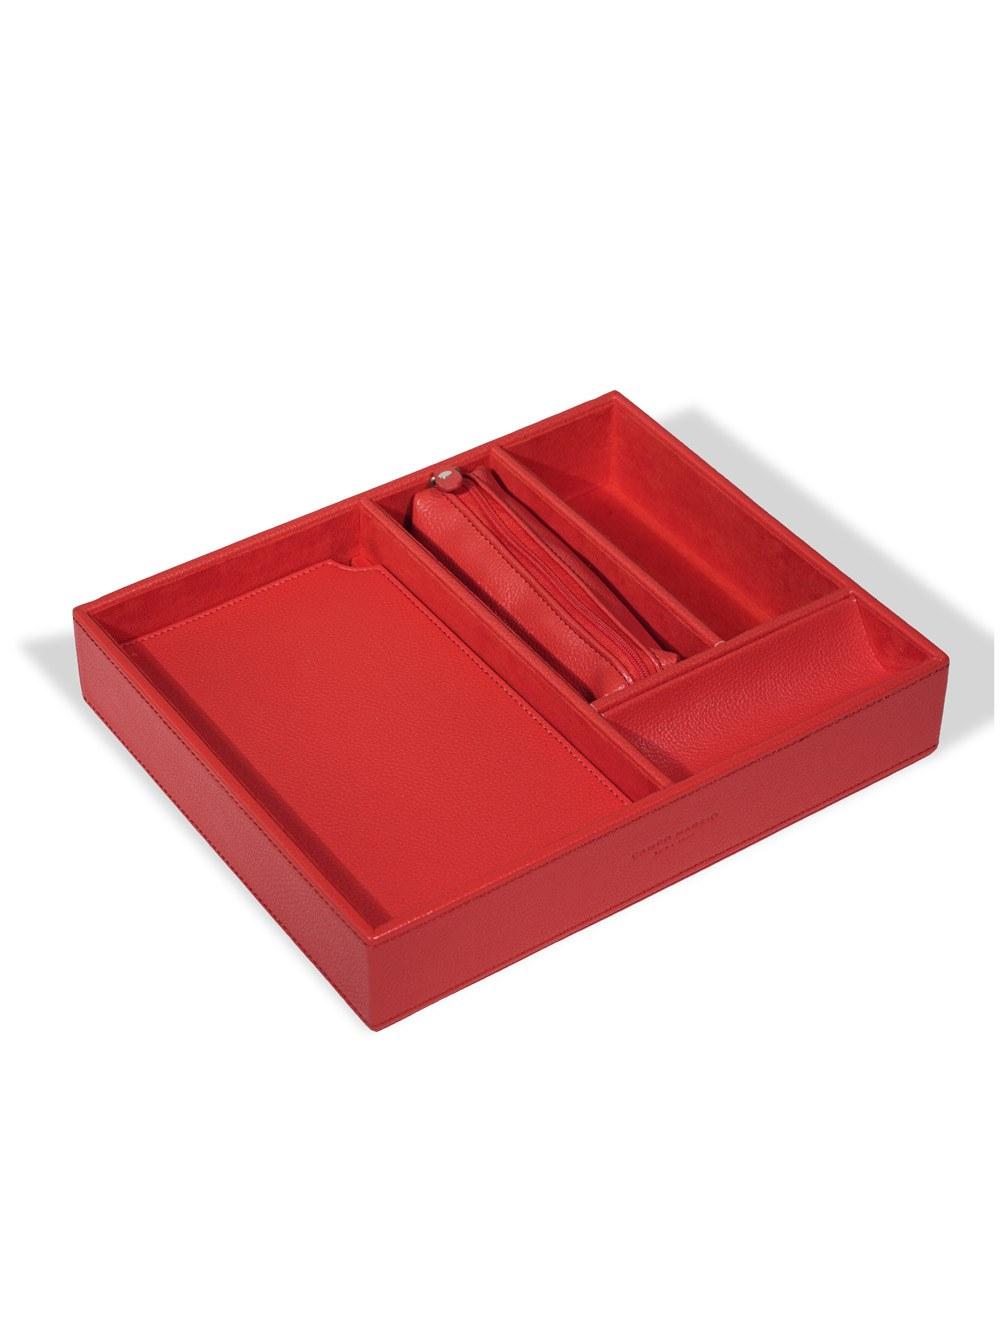 Desk Organiser Voltaire - Cherry Red